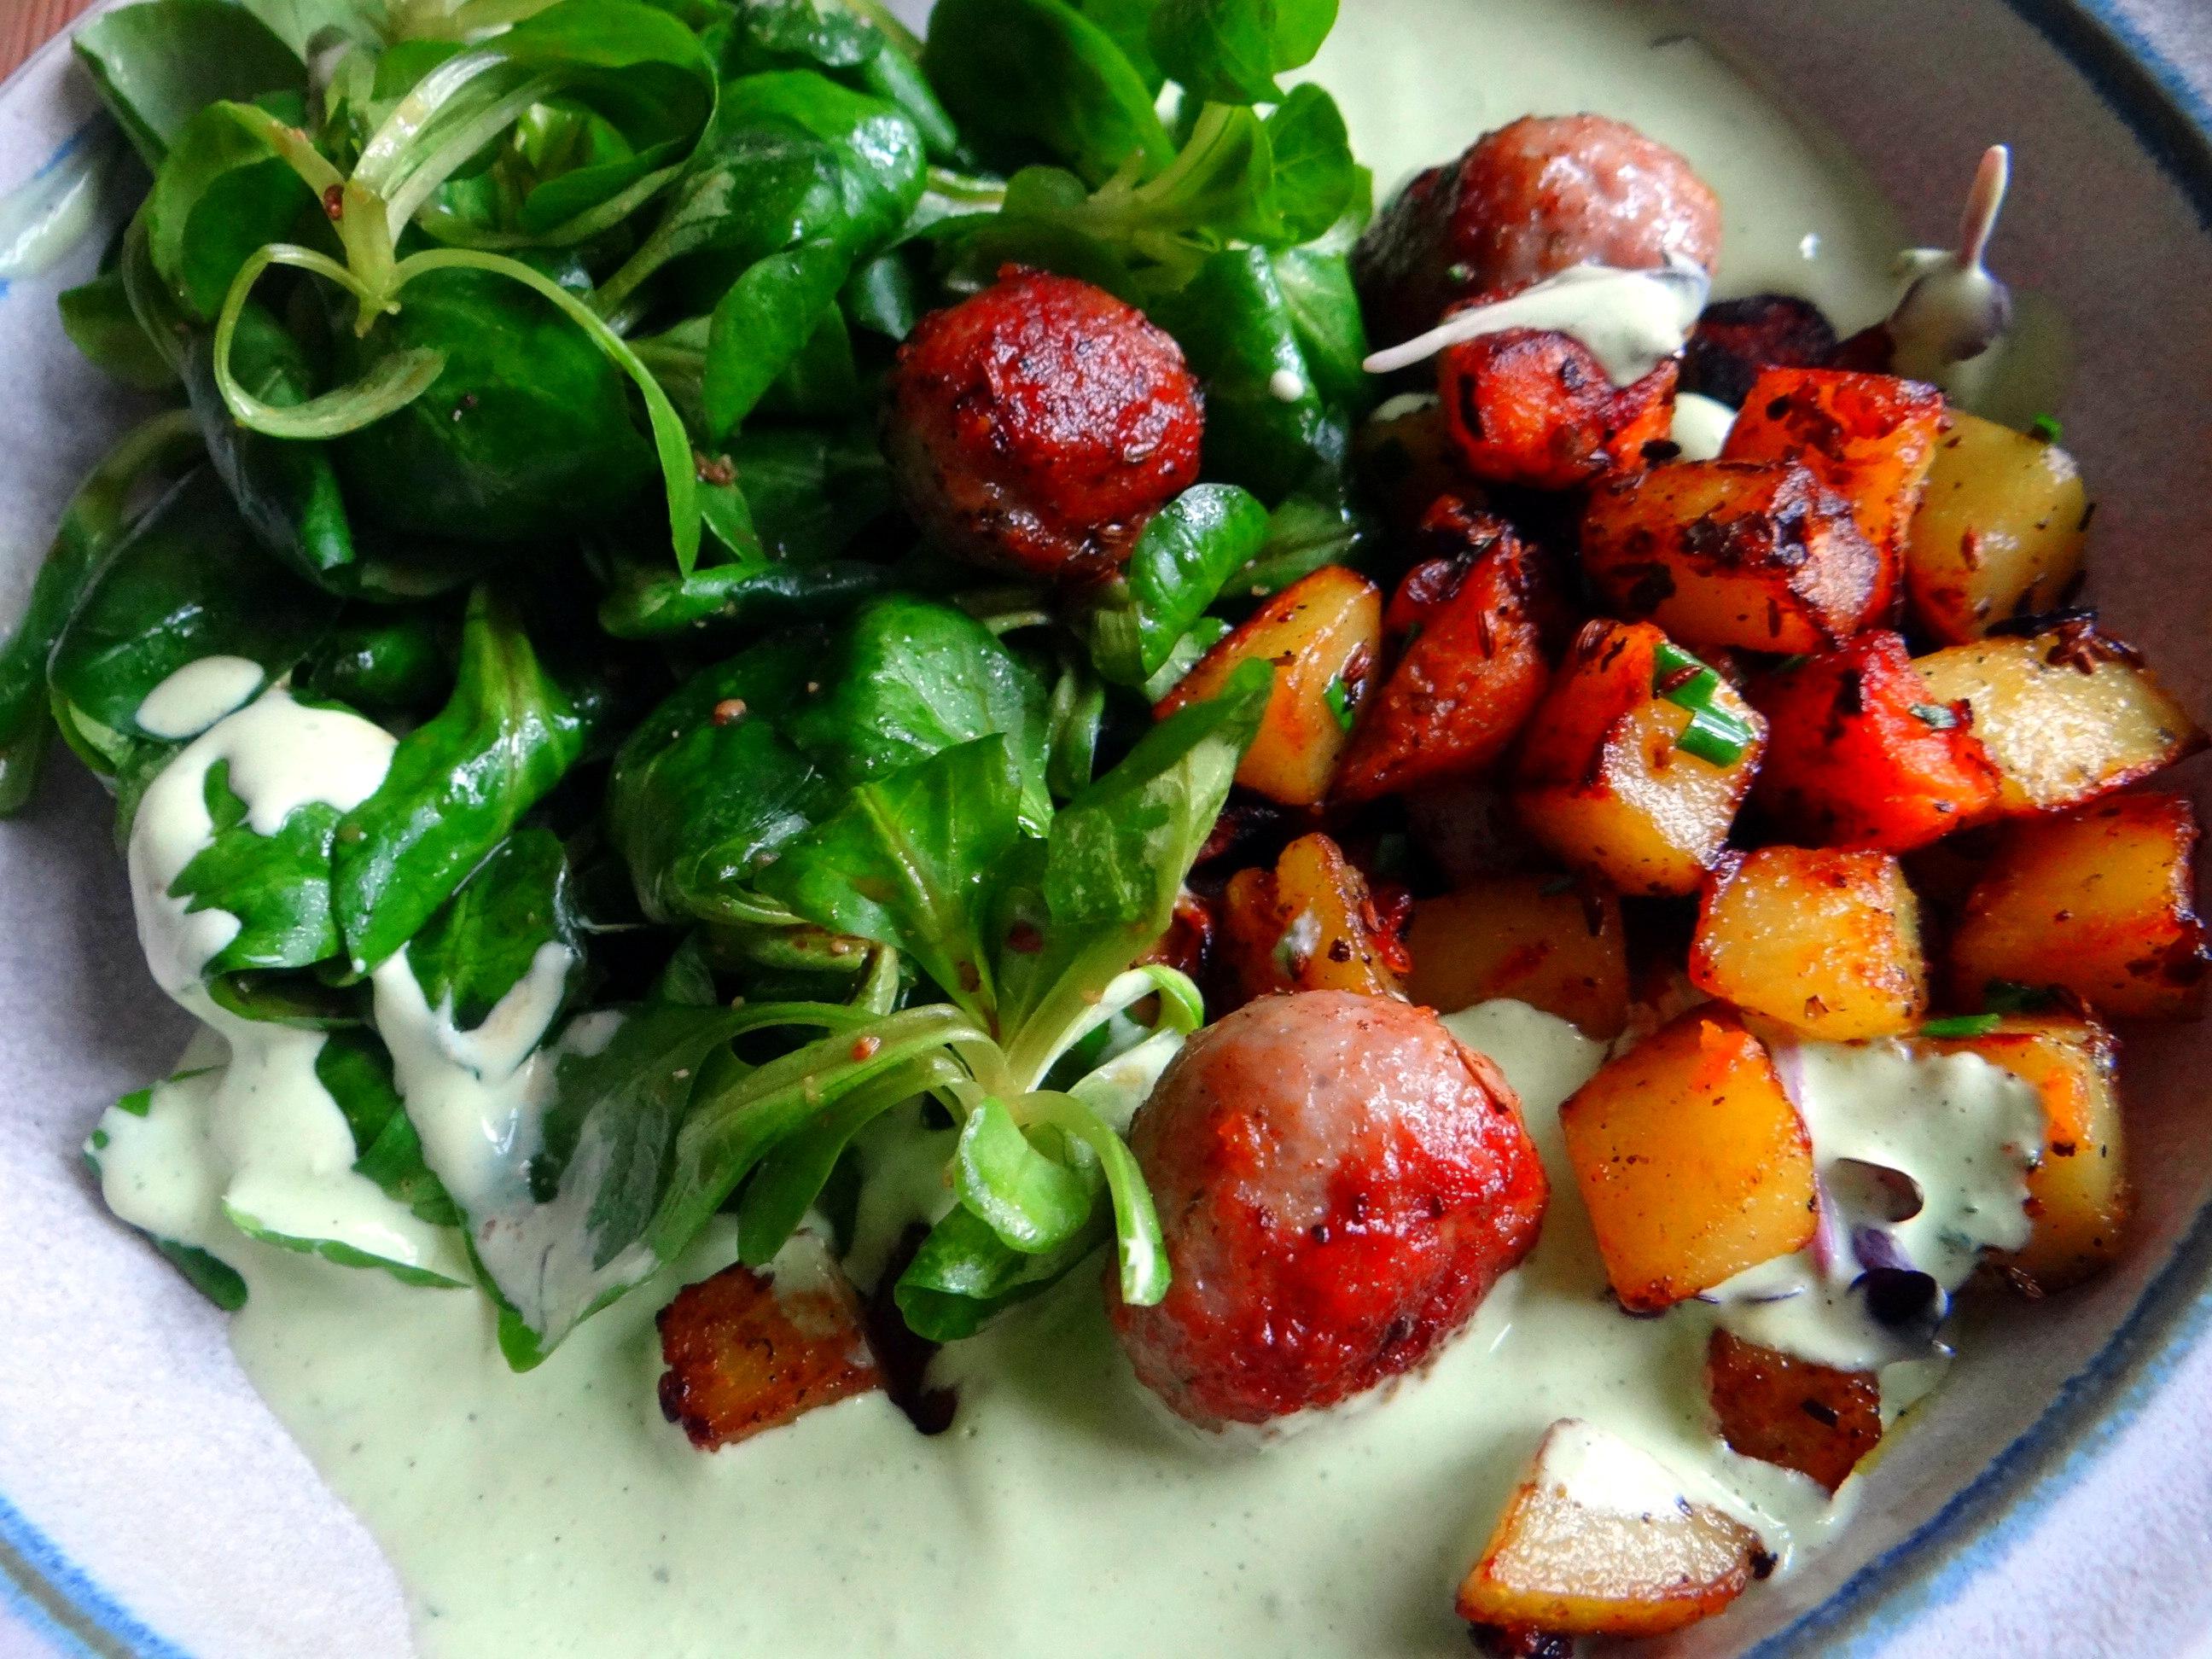 Rohgebratene Kartoffeln,Hackbällchen,Dip,Feldsalat (3)